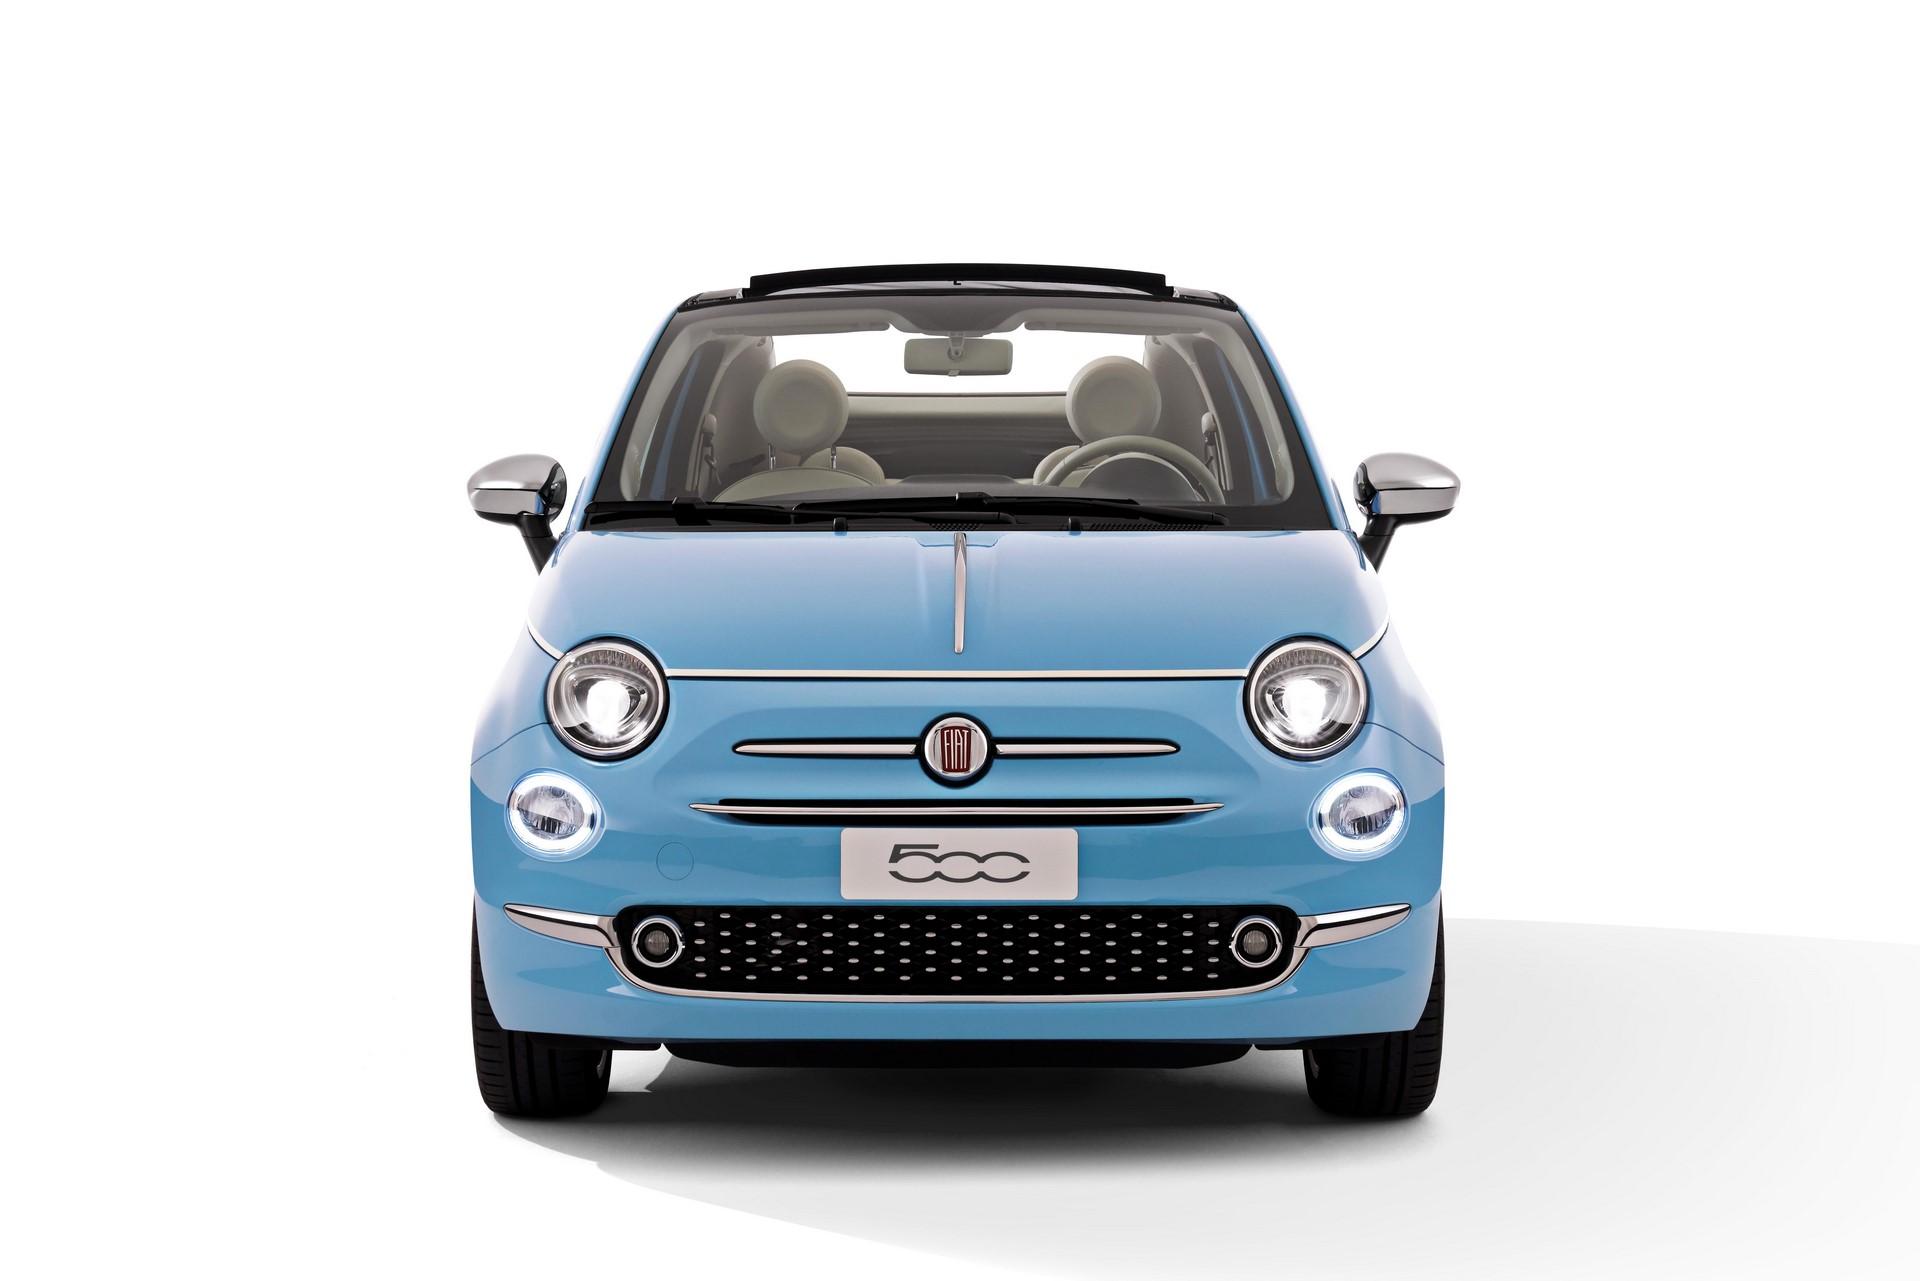 180704_Fiat_500-Spiaggina-58_13